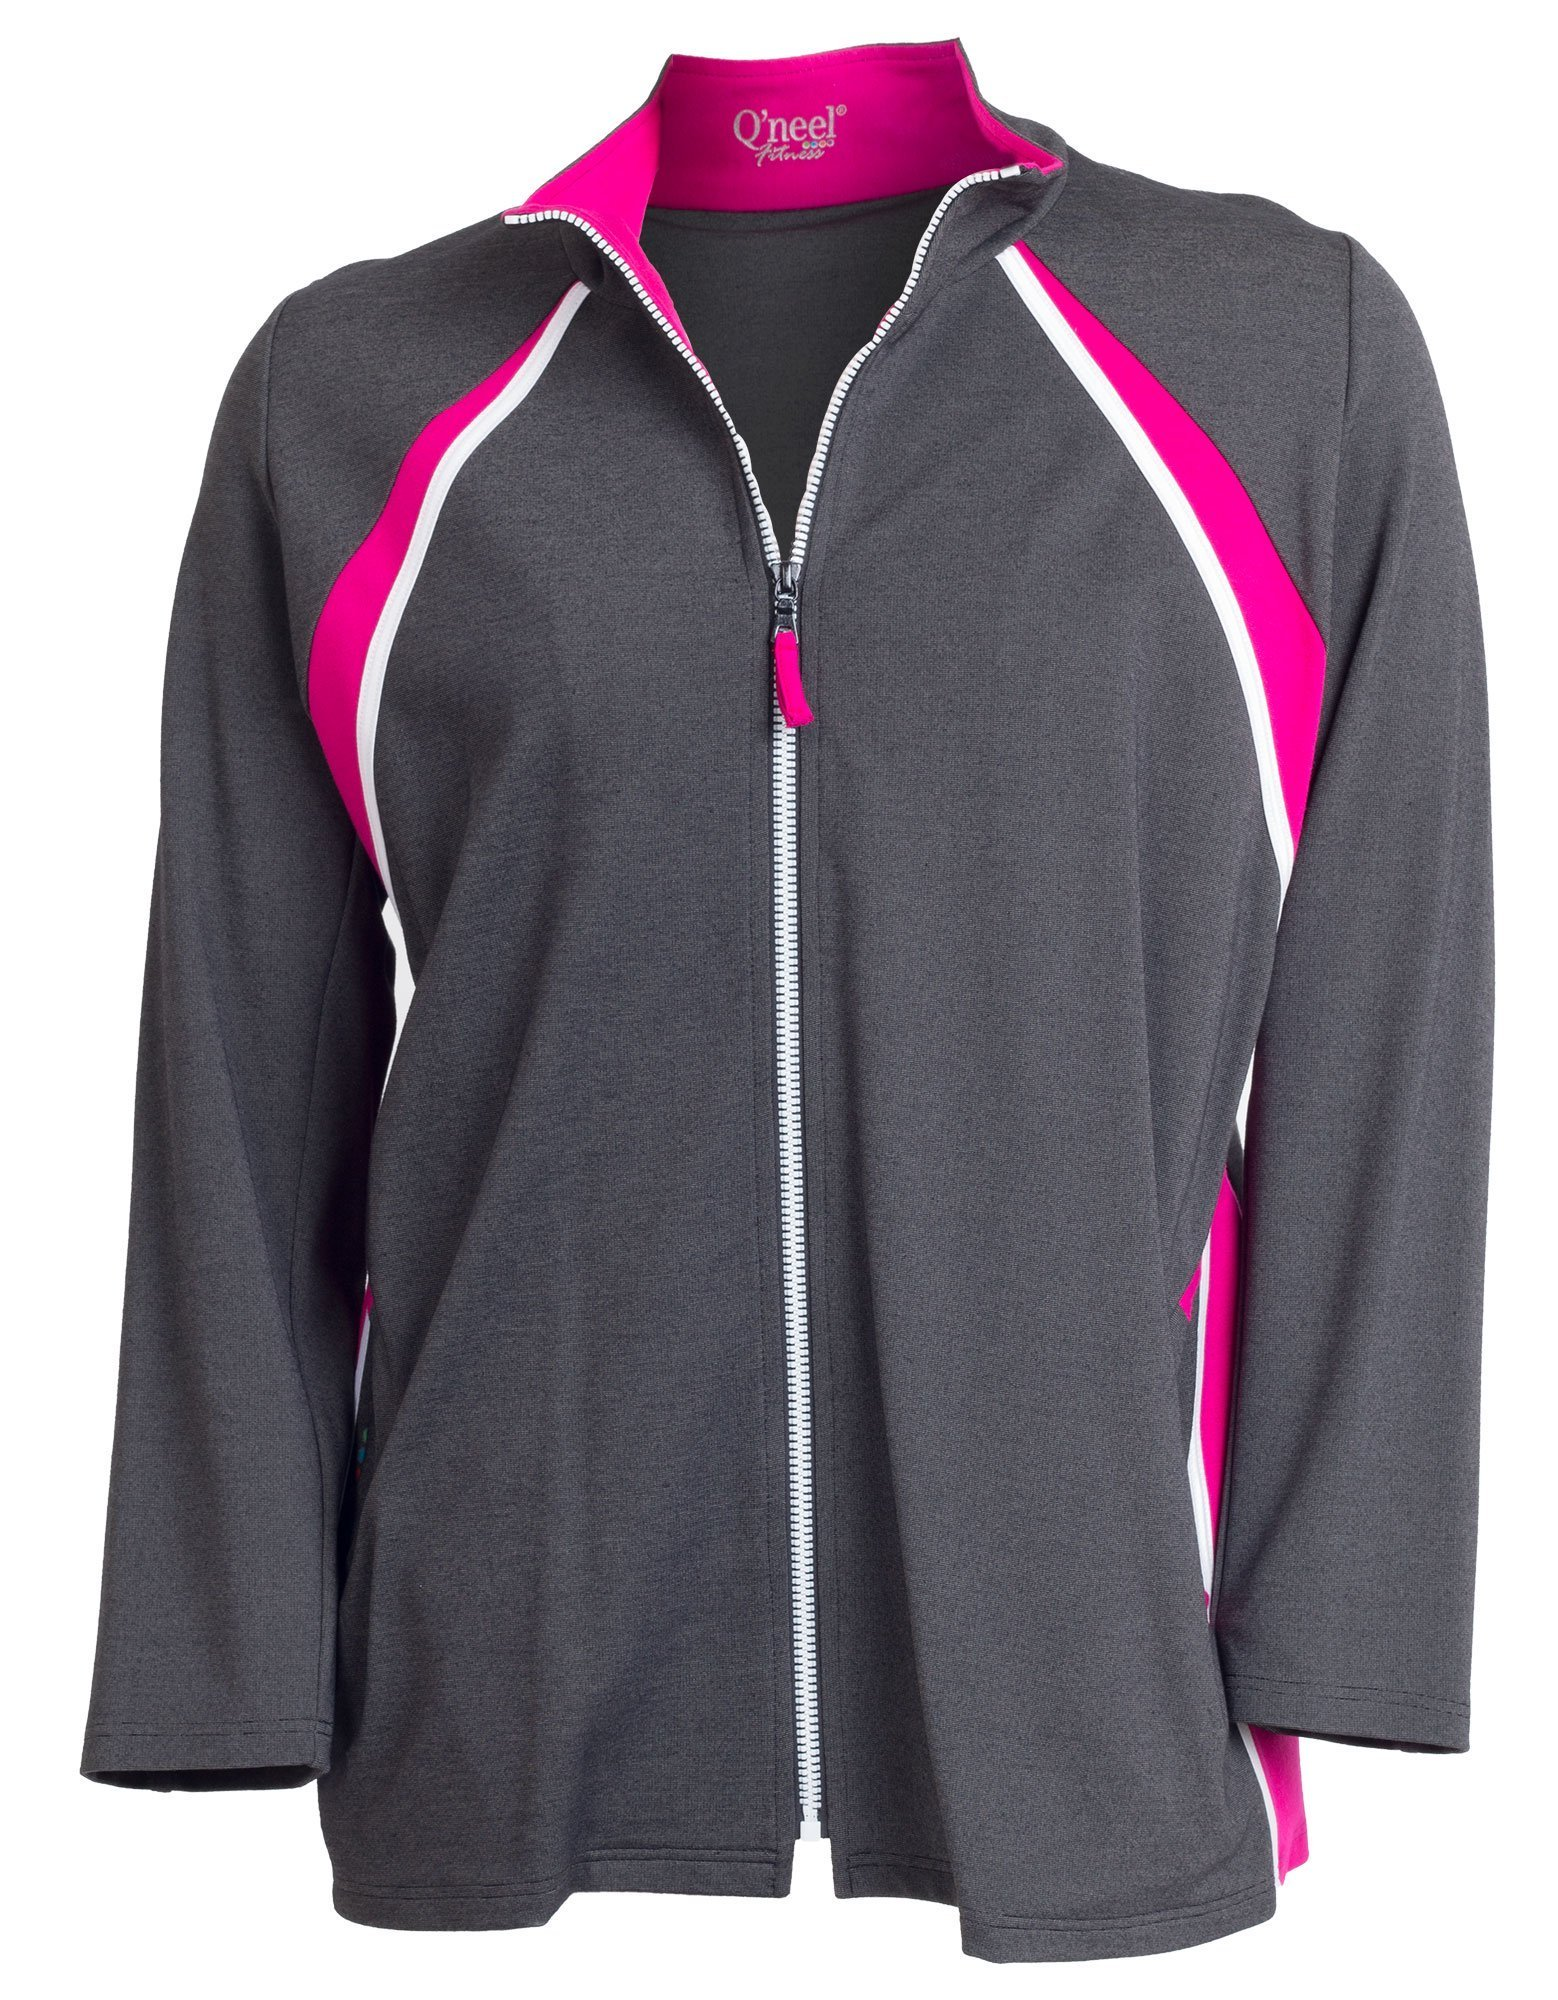 Fitness jakke i grå, pink og hvid